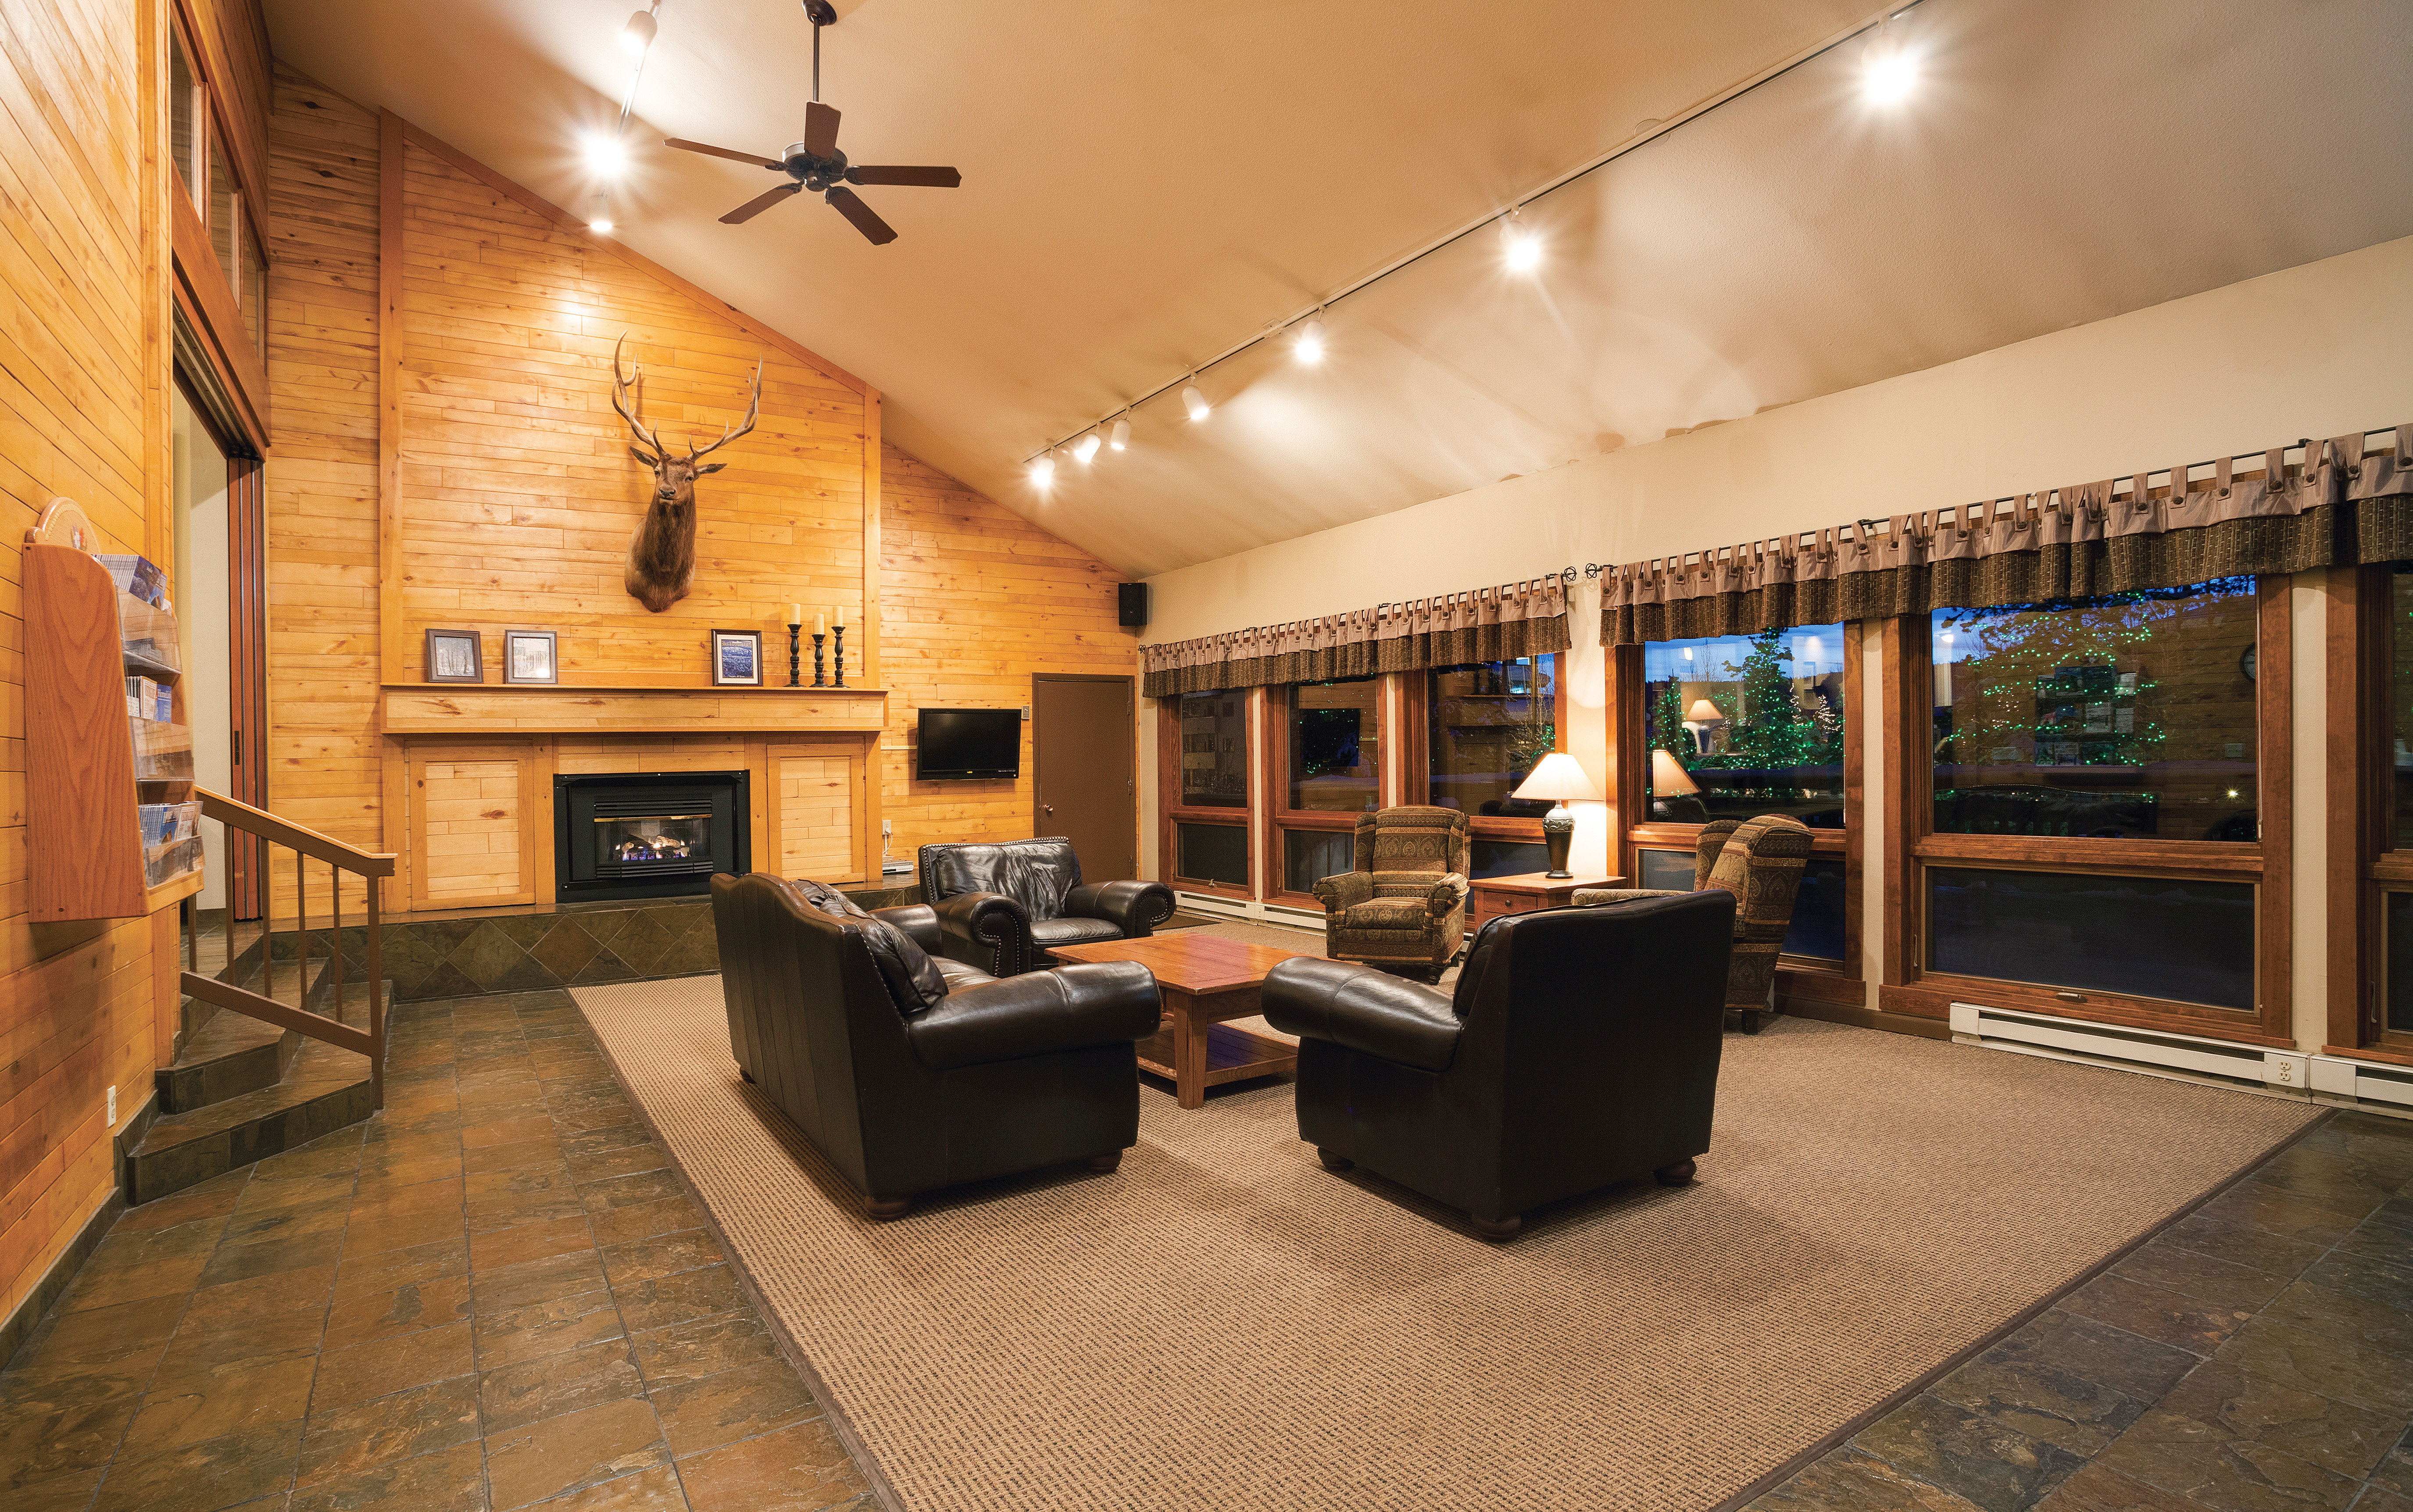 Lobby Lodge Outdoors Scenic views Ski property living room home condominium Villa loft